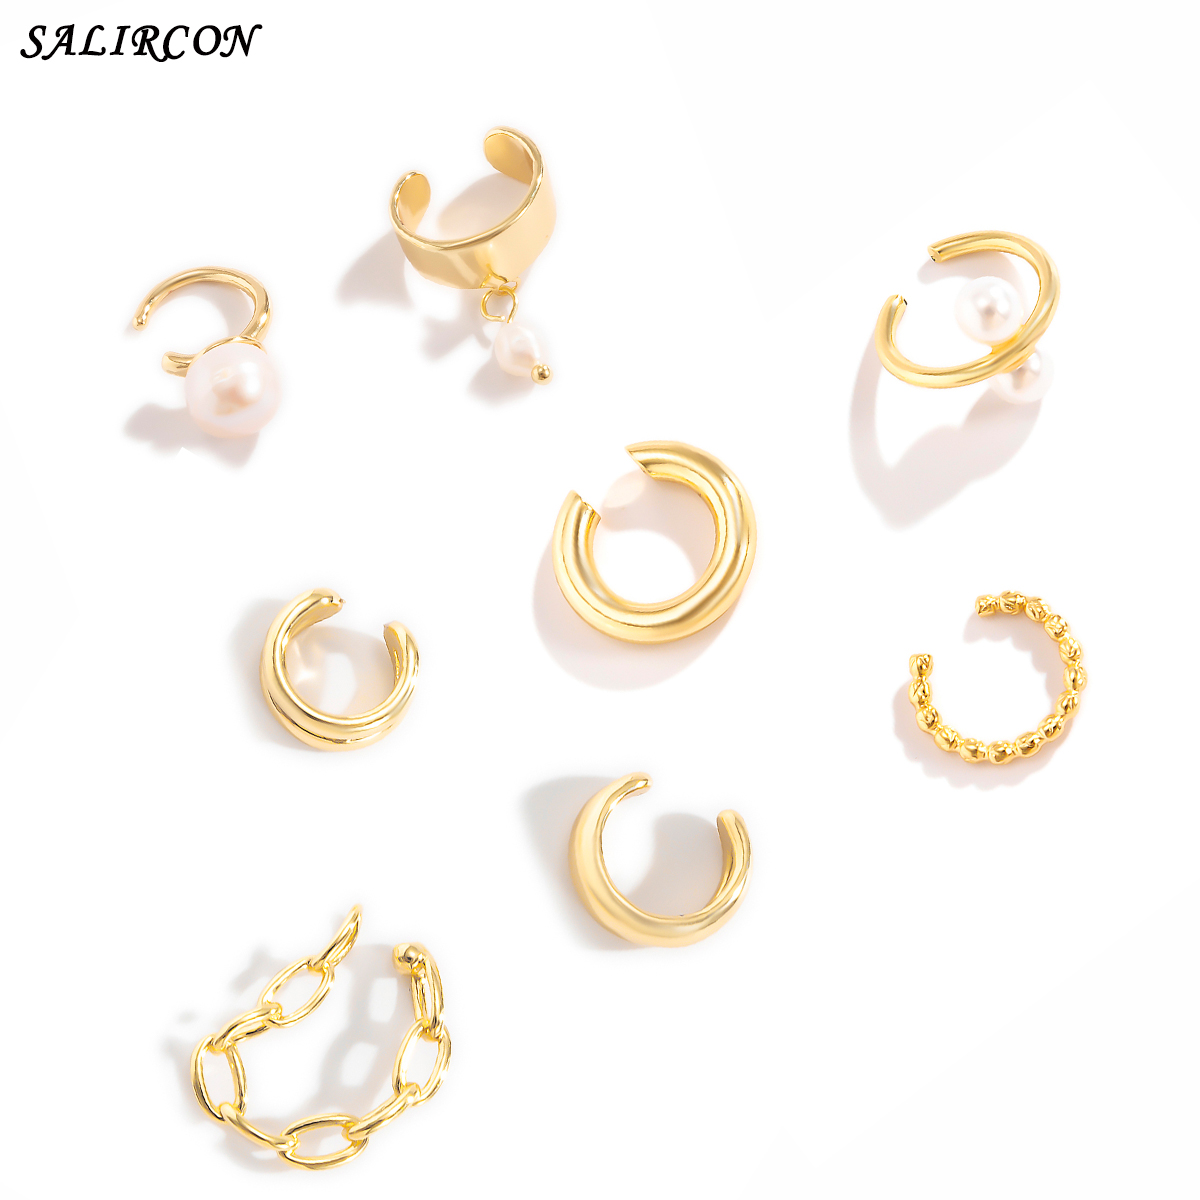 Salircon Kpop Imitation Pearl Ear Clips for Women Earrings Geometric Round Circle Gold Color Ear Cuff Earring Jewelry 2021 Trend